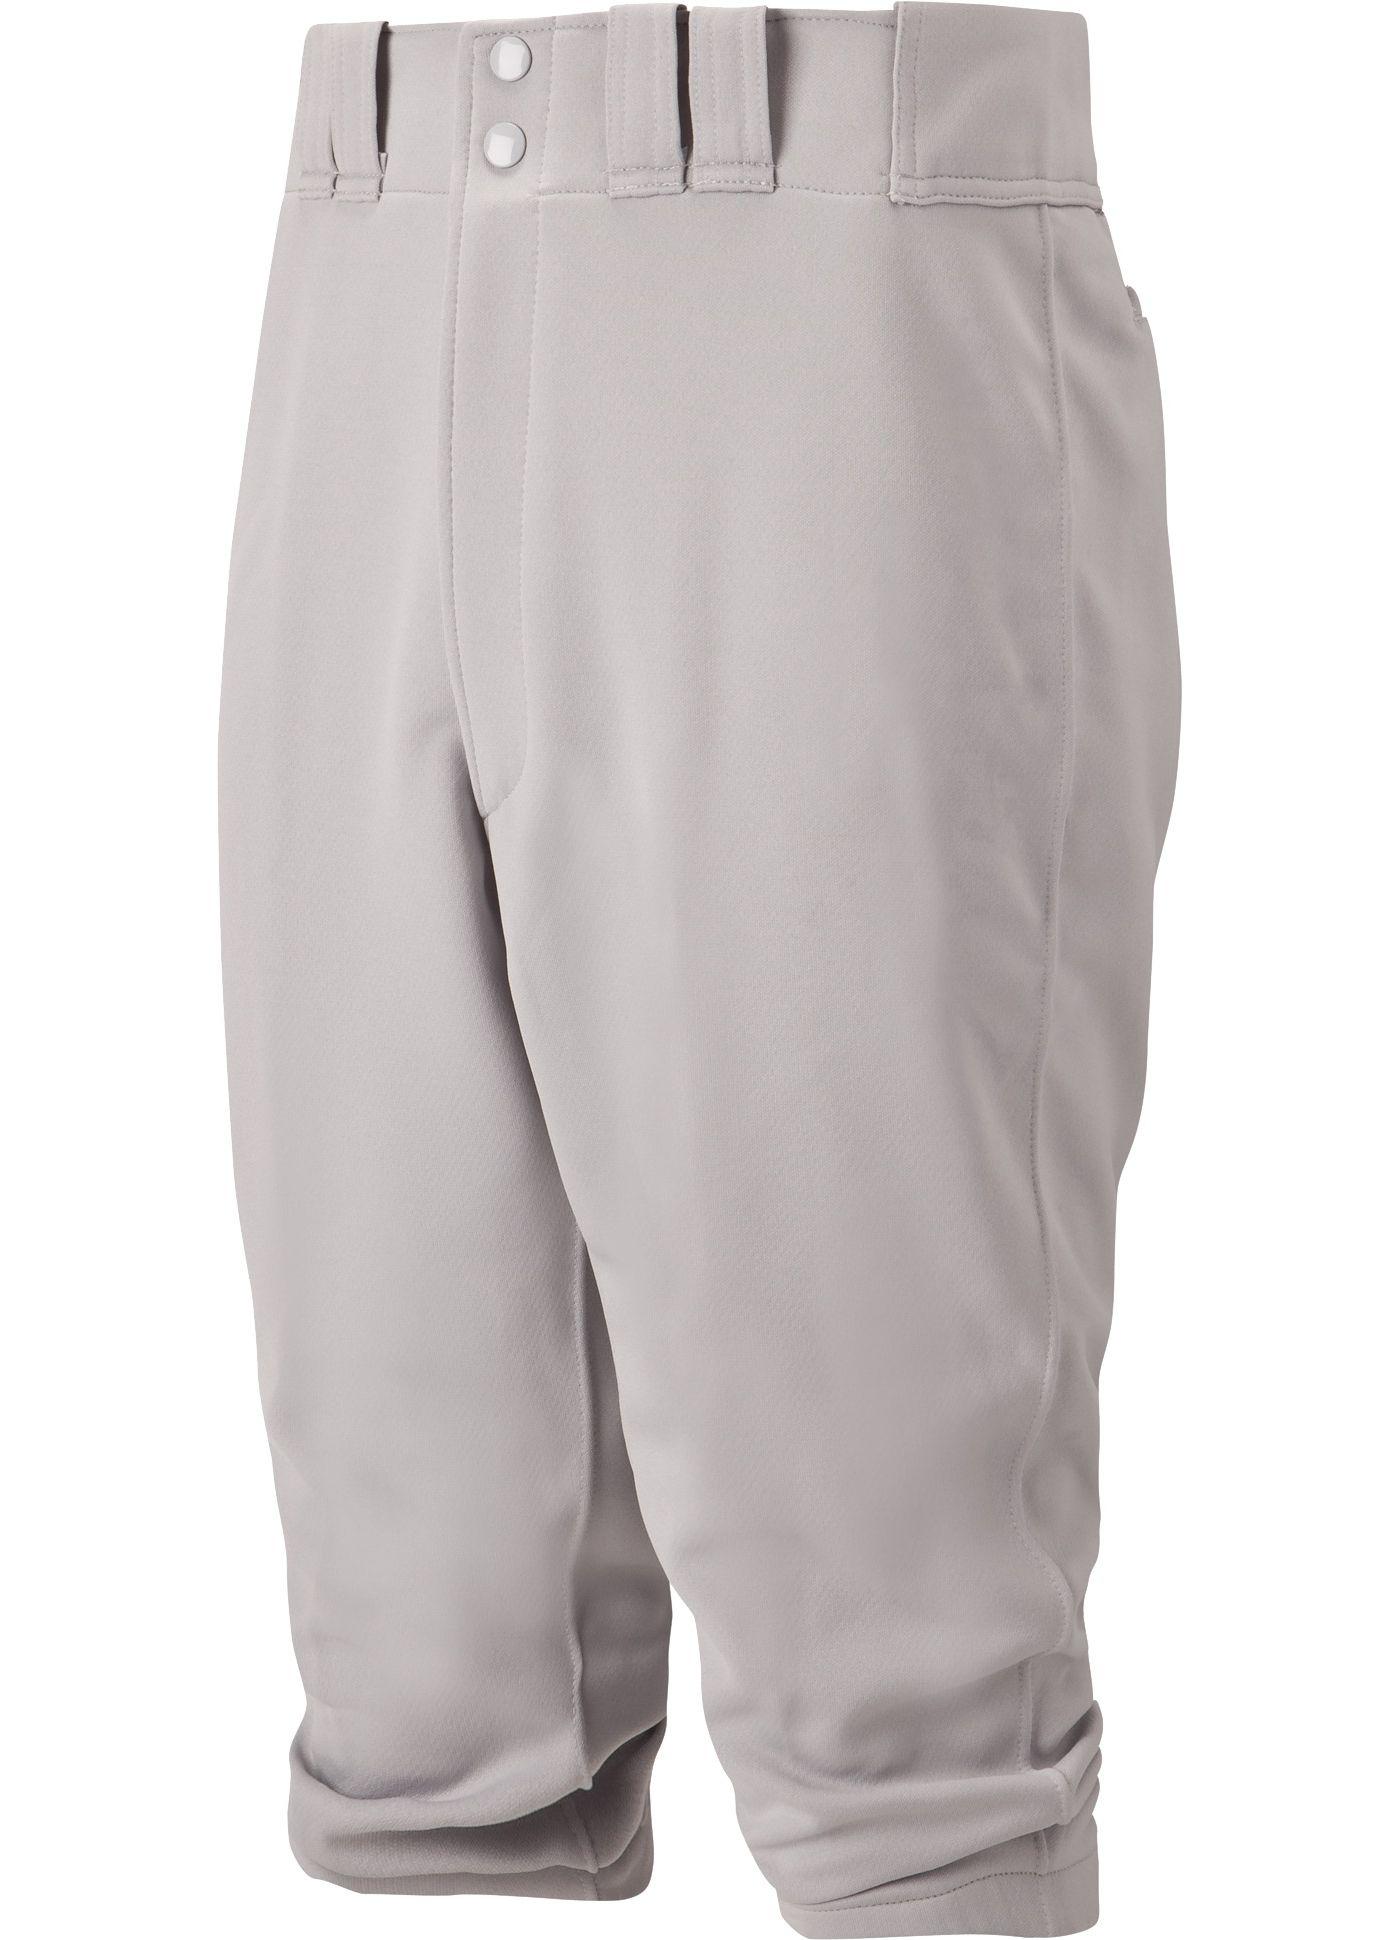 Mizuno Boys' Select Knicker Baseball Pants